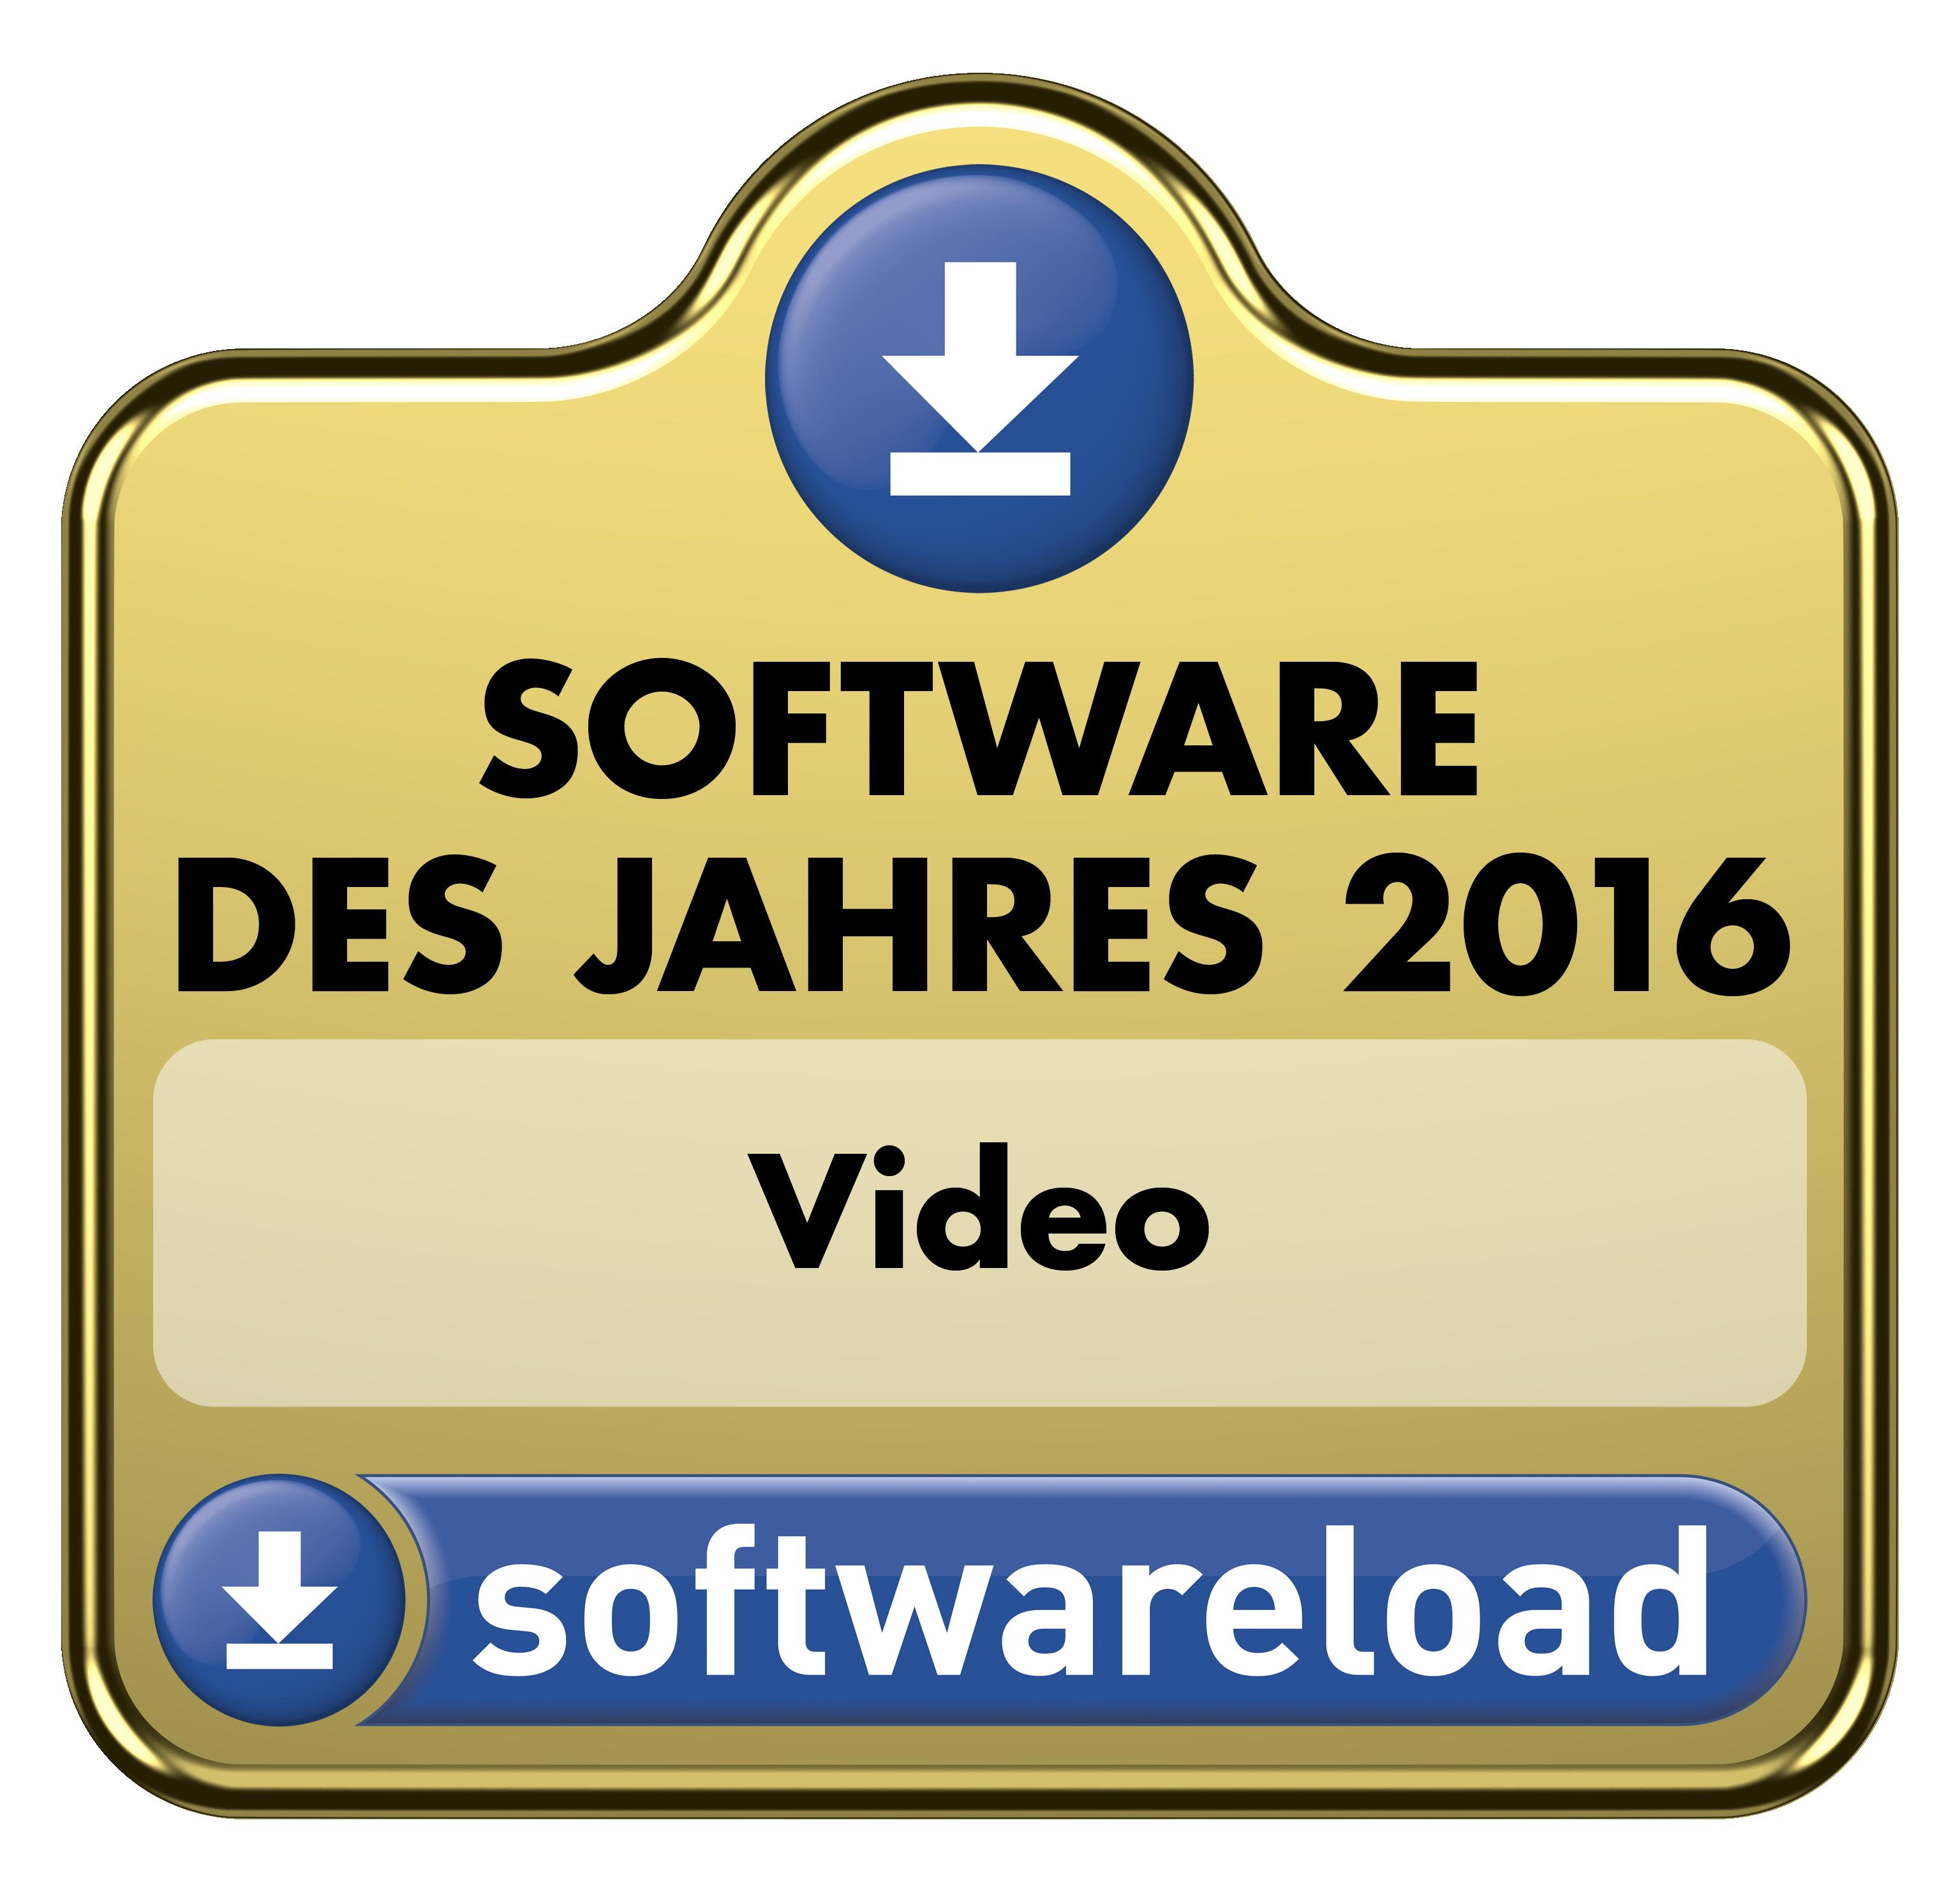 SWDJ 2016 Signet Gold Video